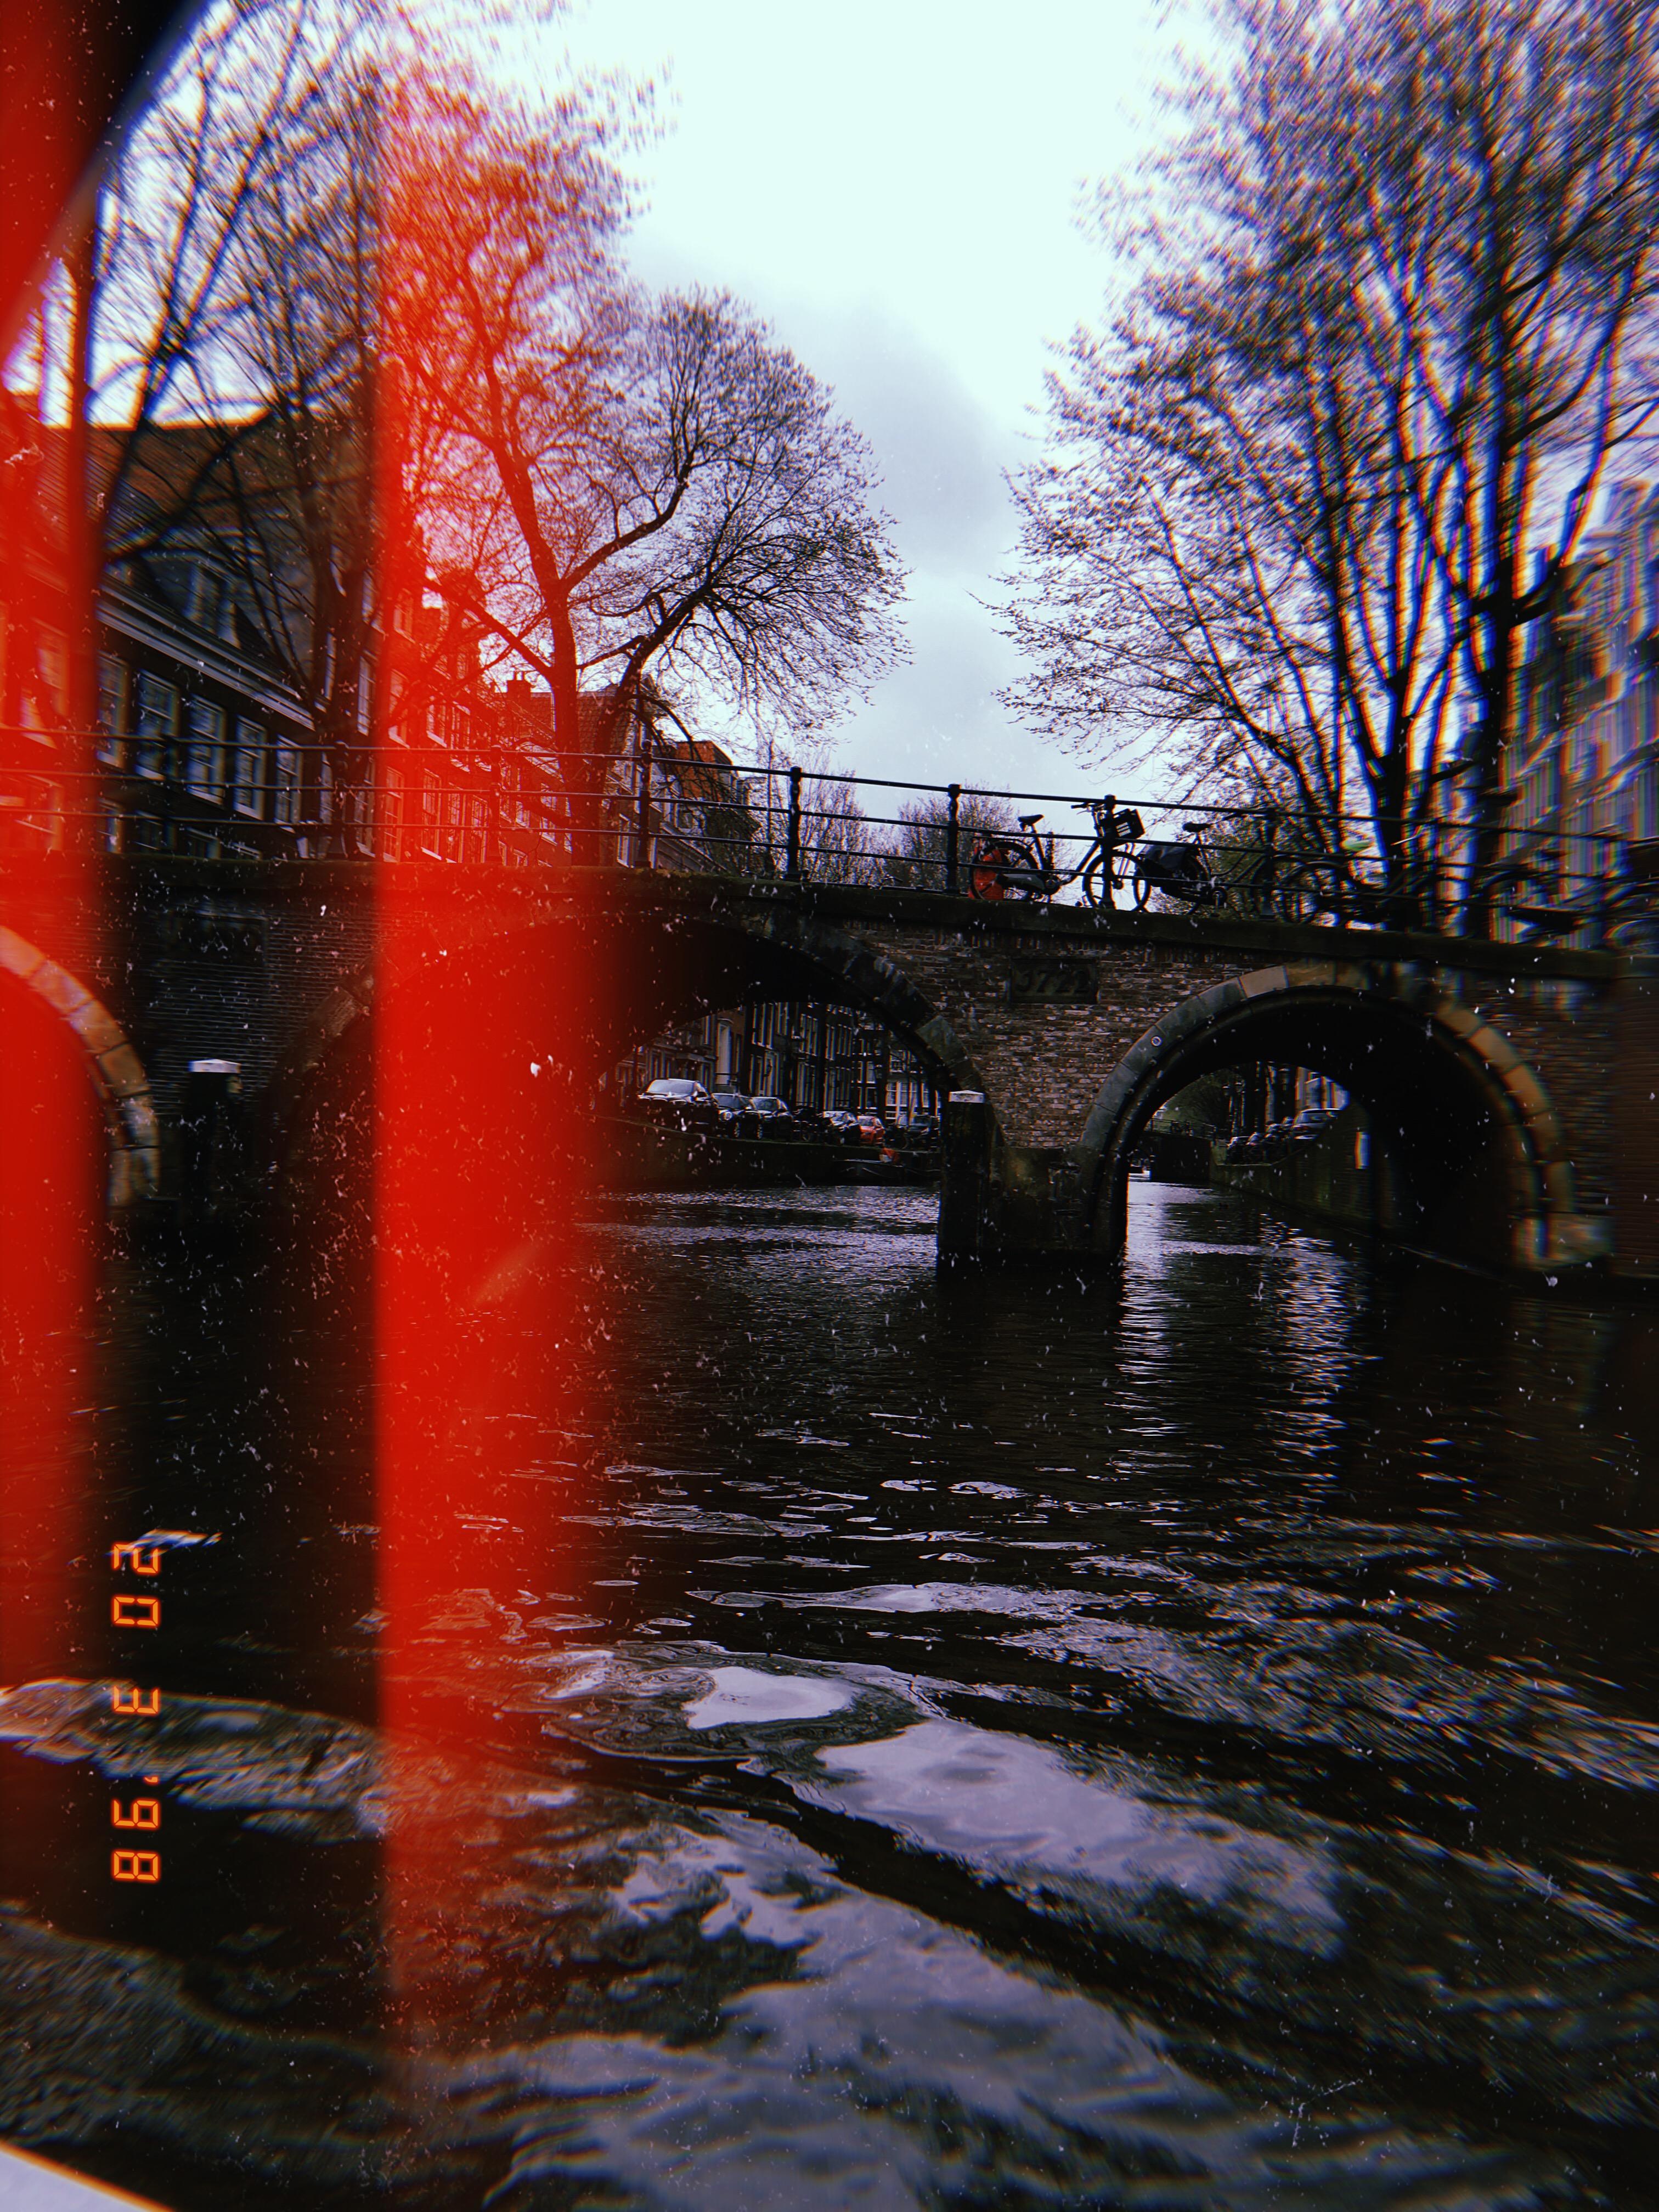 2019-03-20 12_59_39.532